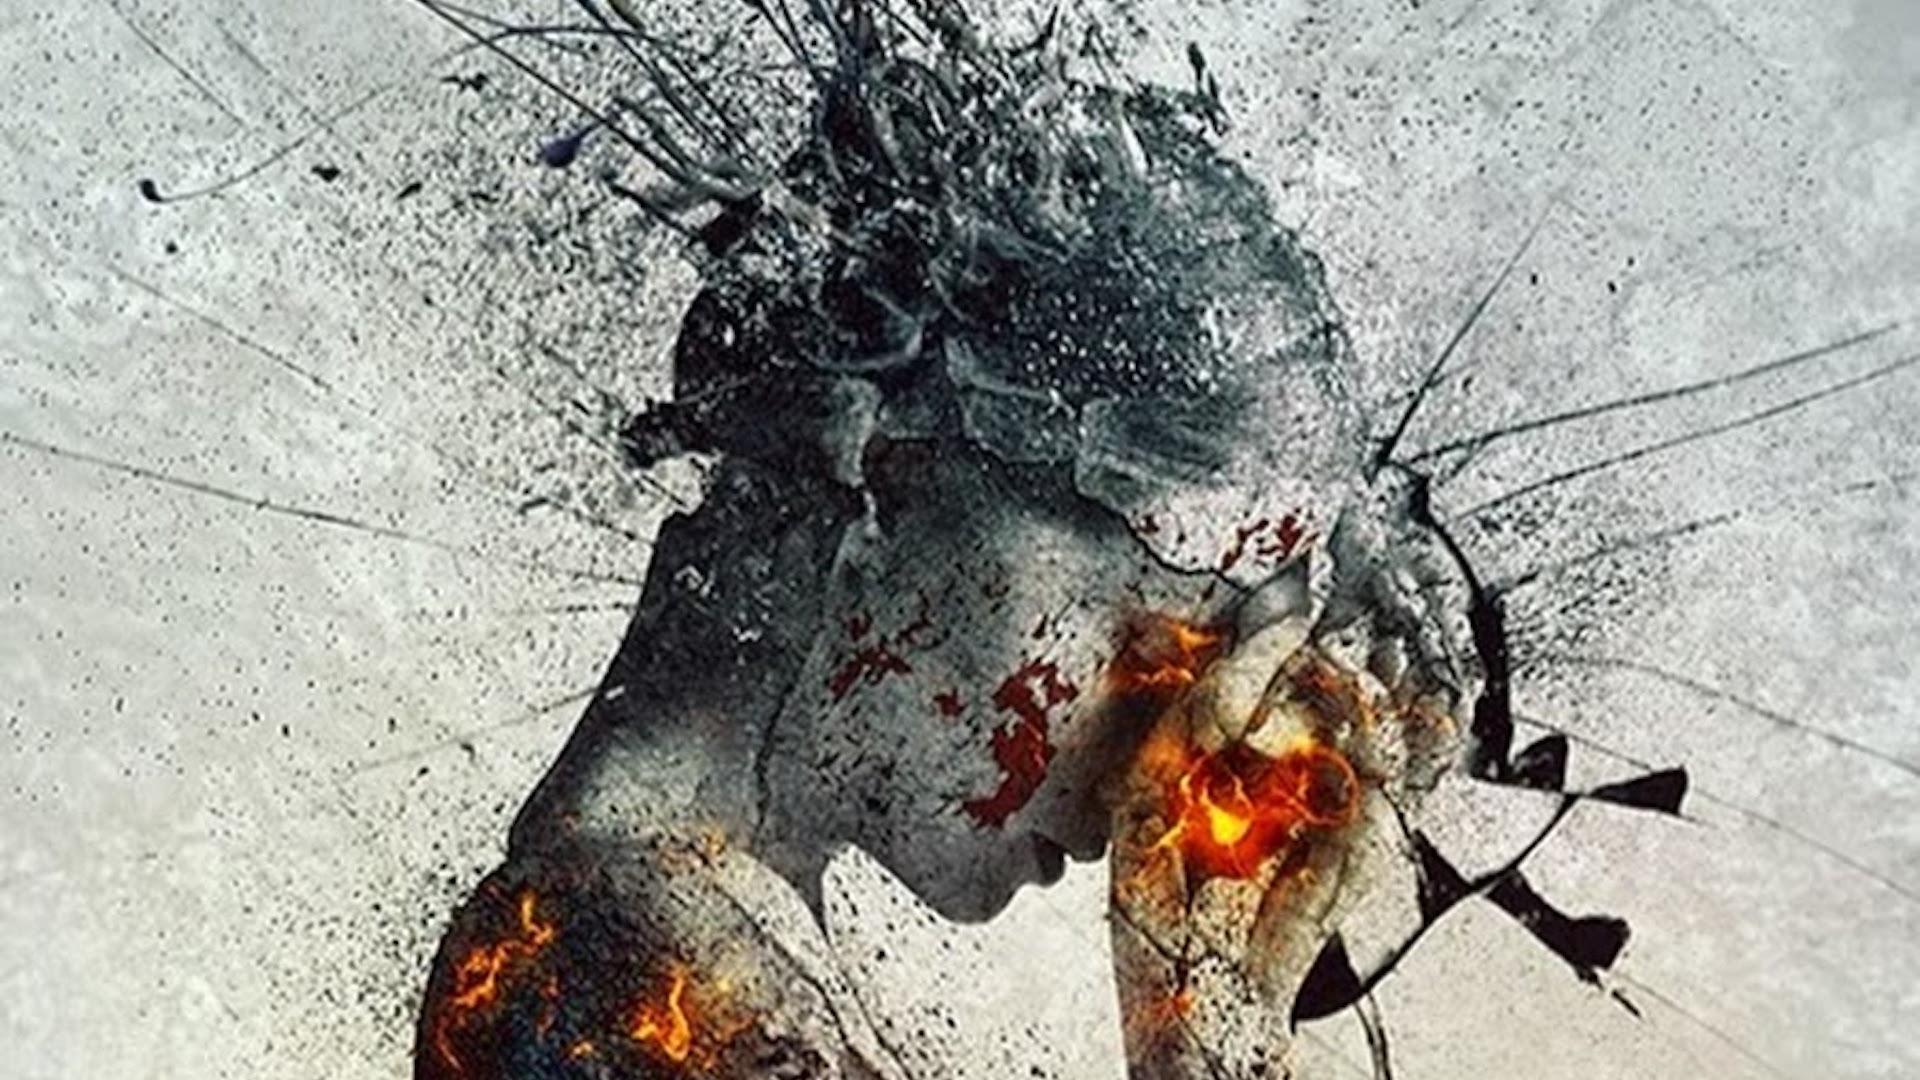 Online Psikolog | Online Terapi TRAVMA SONRASI STRES BOZUKLUĞU